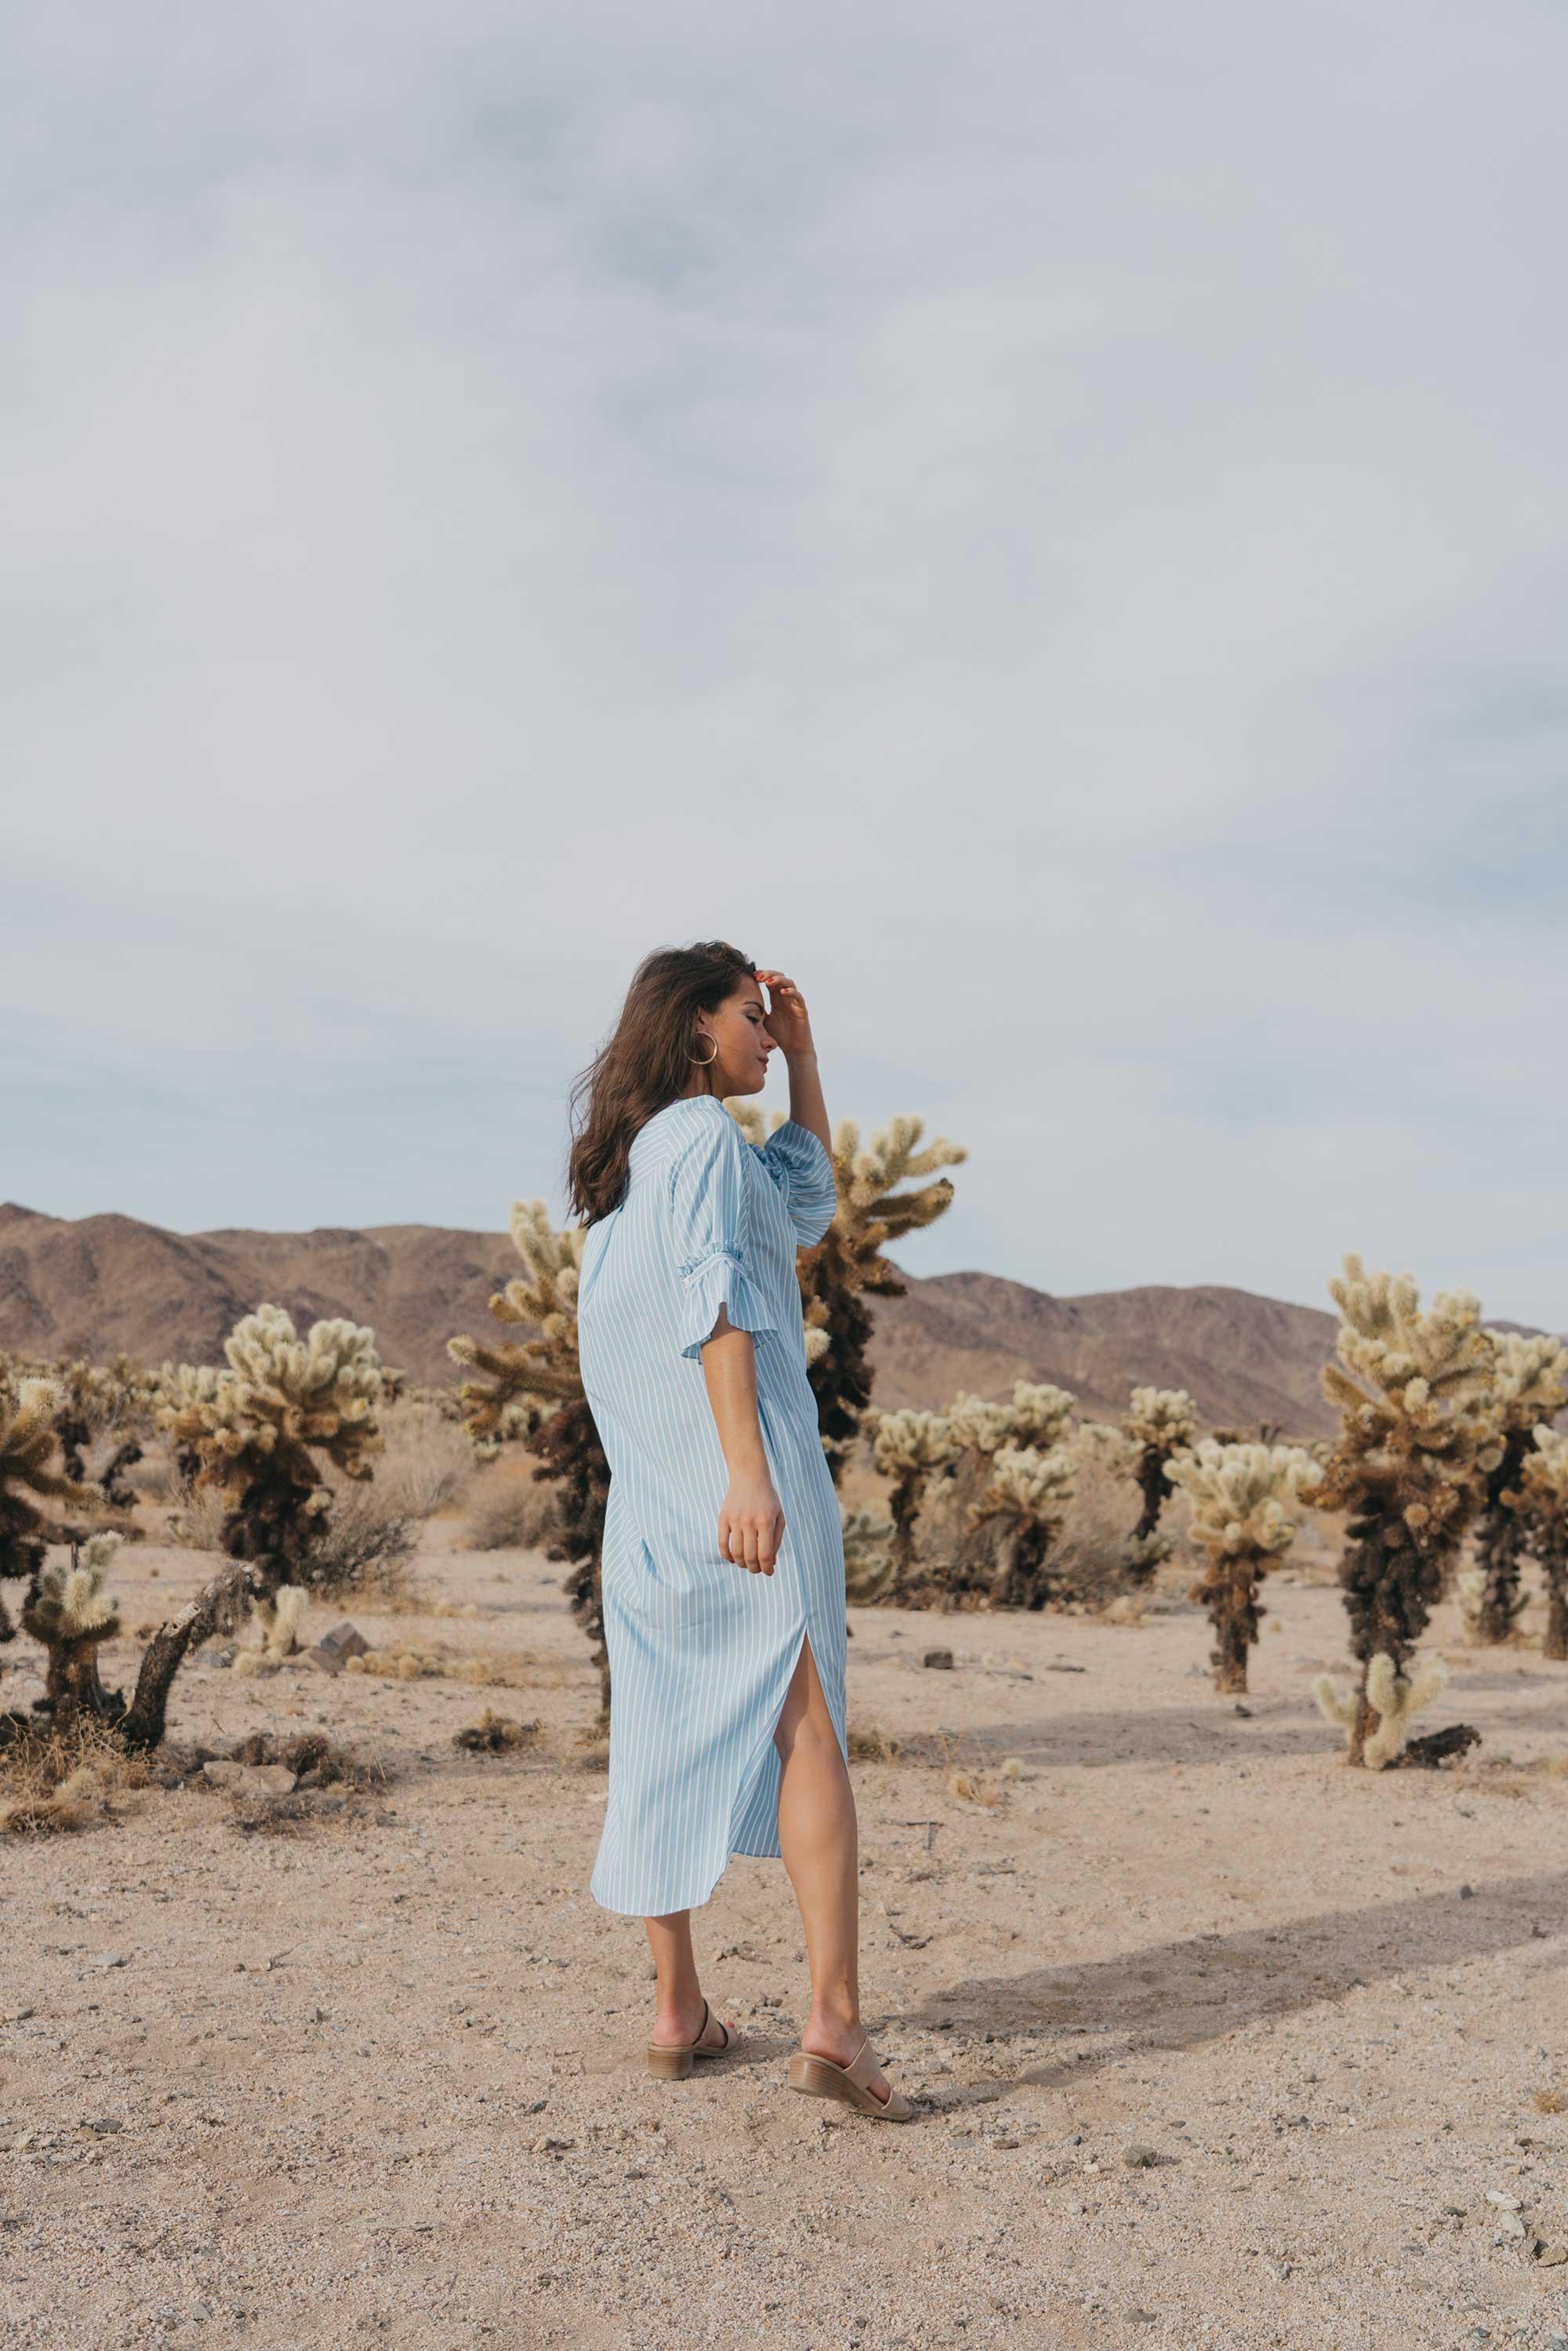 Frill Sleeve Maxi Shirt Dress Festival Outfit Coachella Joshua Tree Cholla Cactus Garden24.jpg